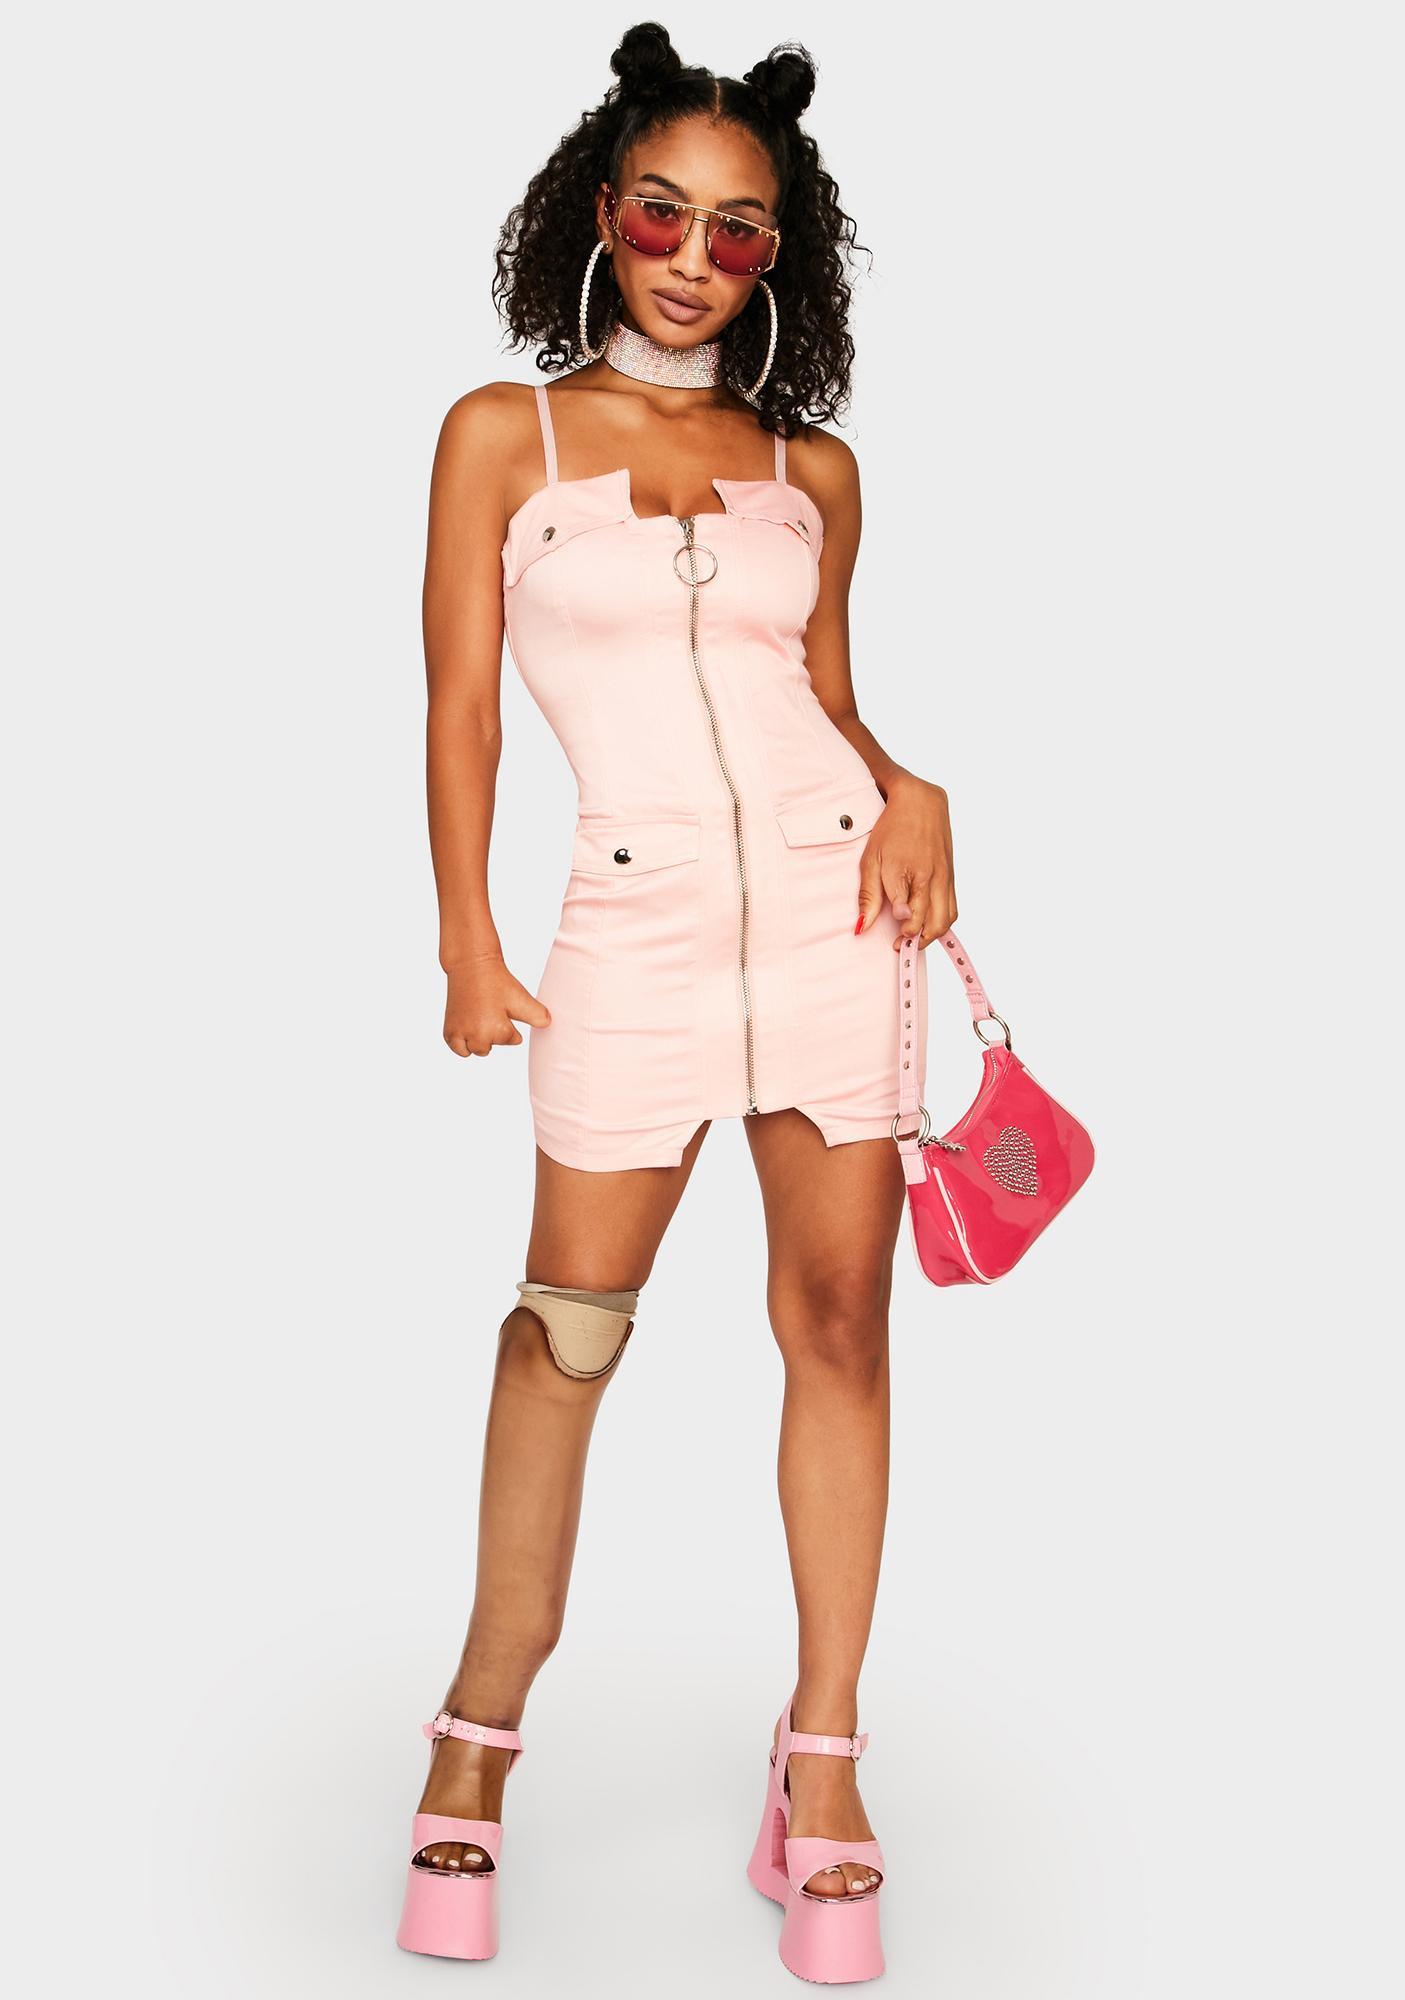 Diva Queen of Mean Denim Mini Dress